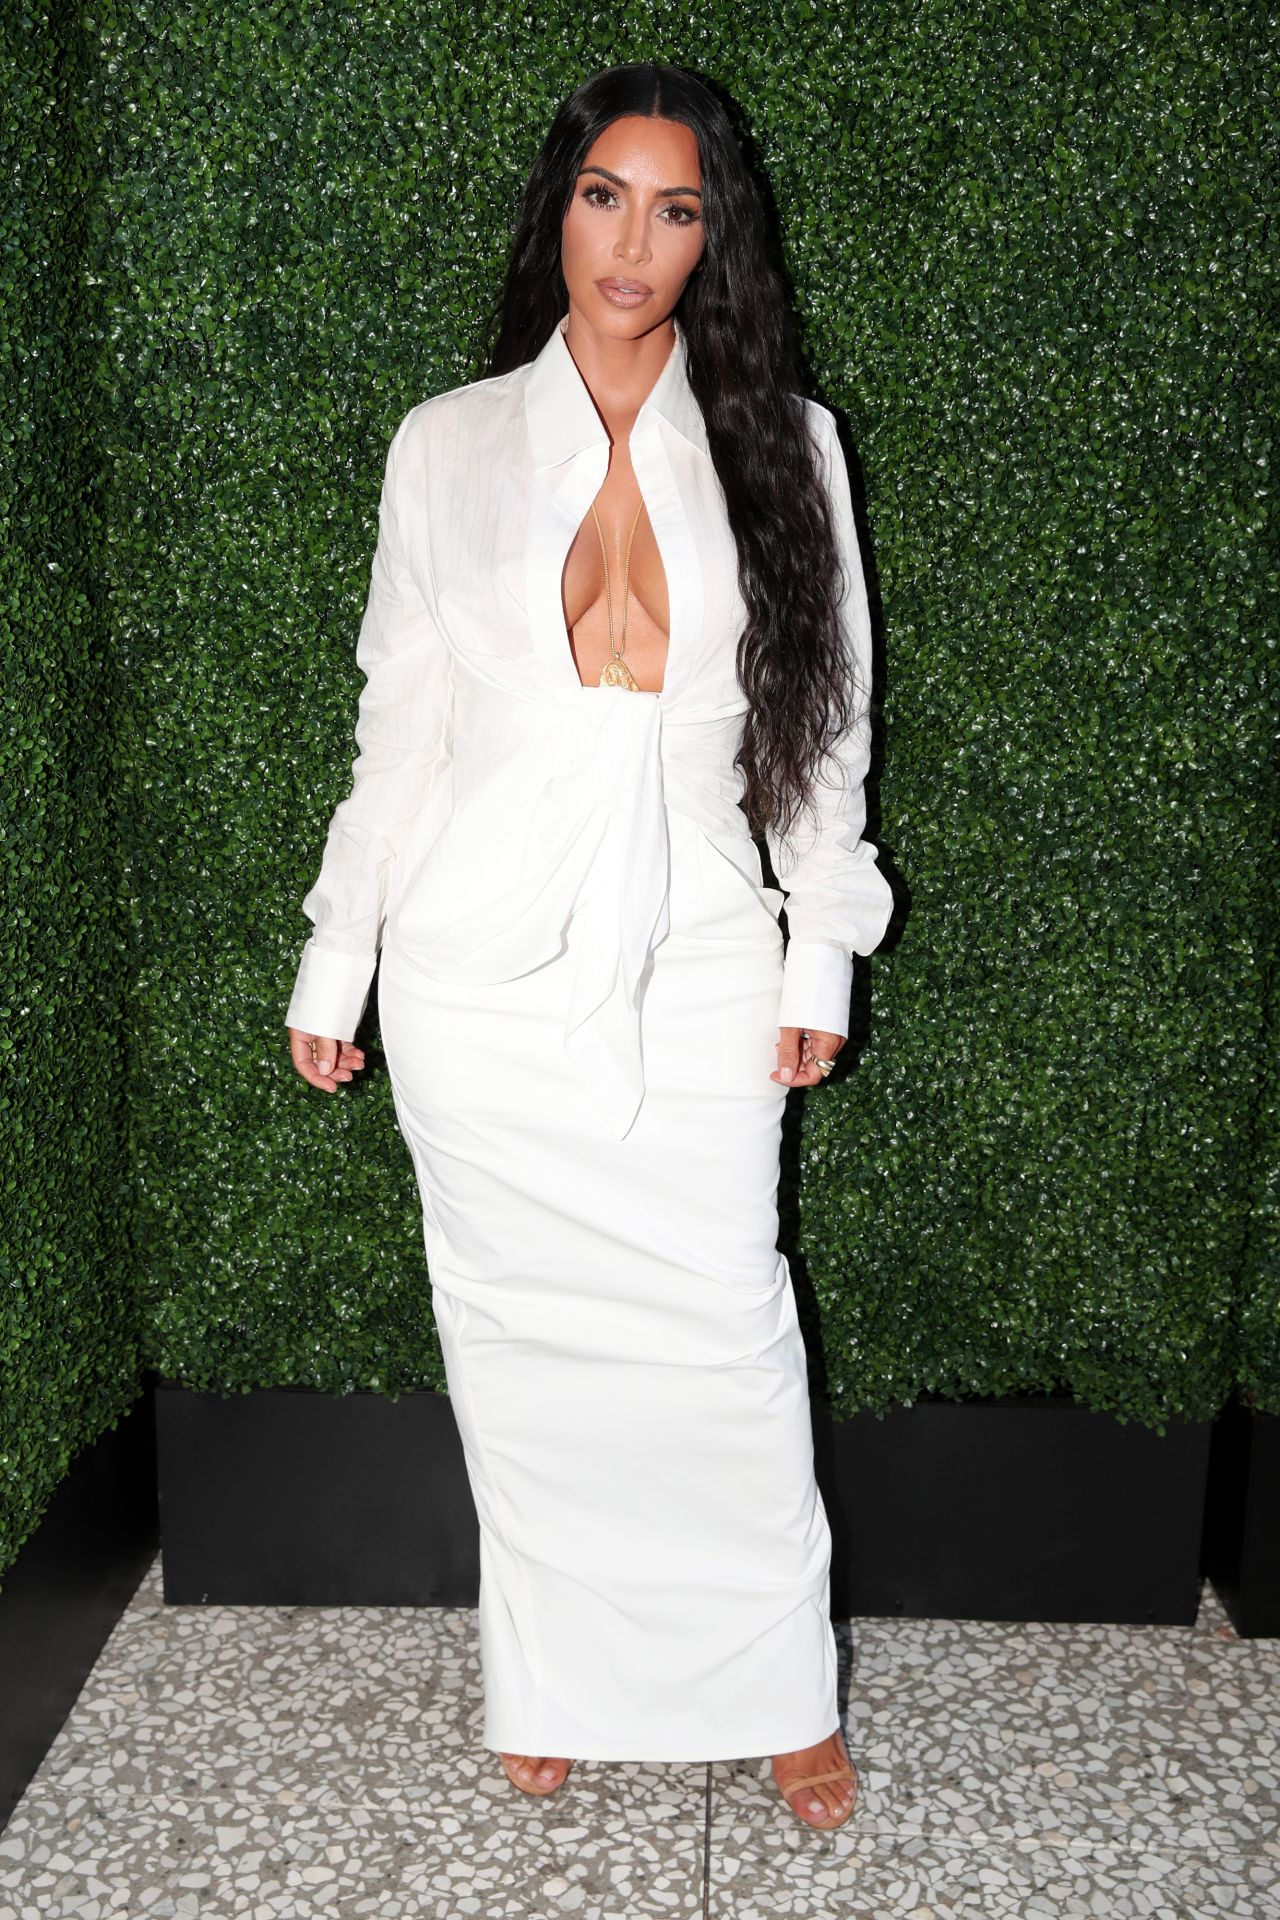 Kim Kardashian Latest Photos - CelebMafia Kim Kardashian